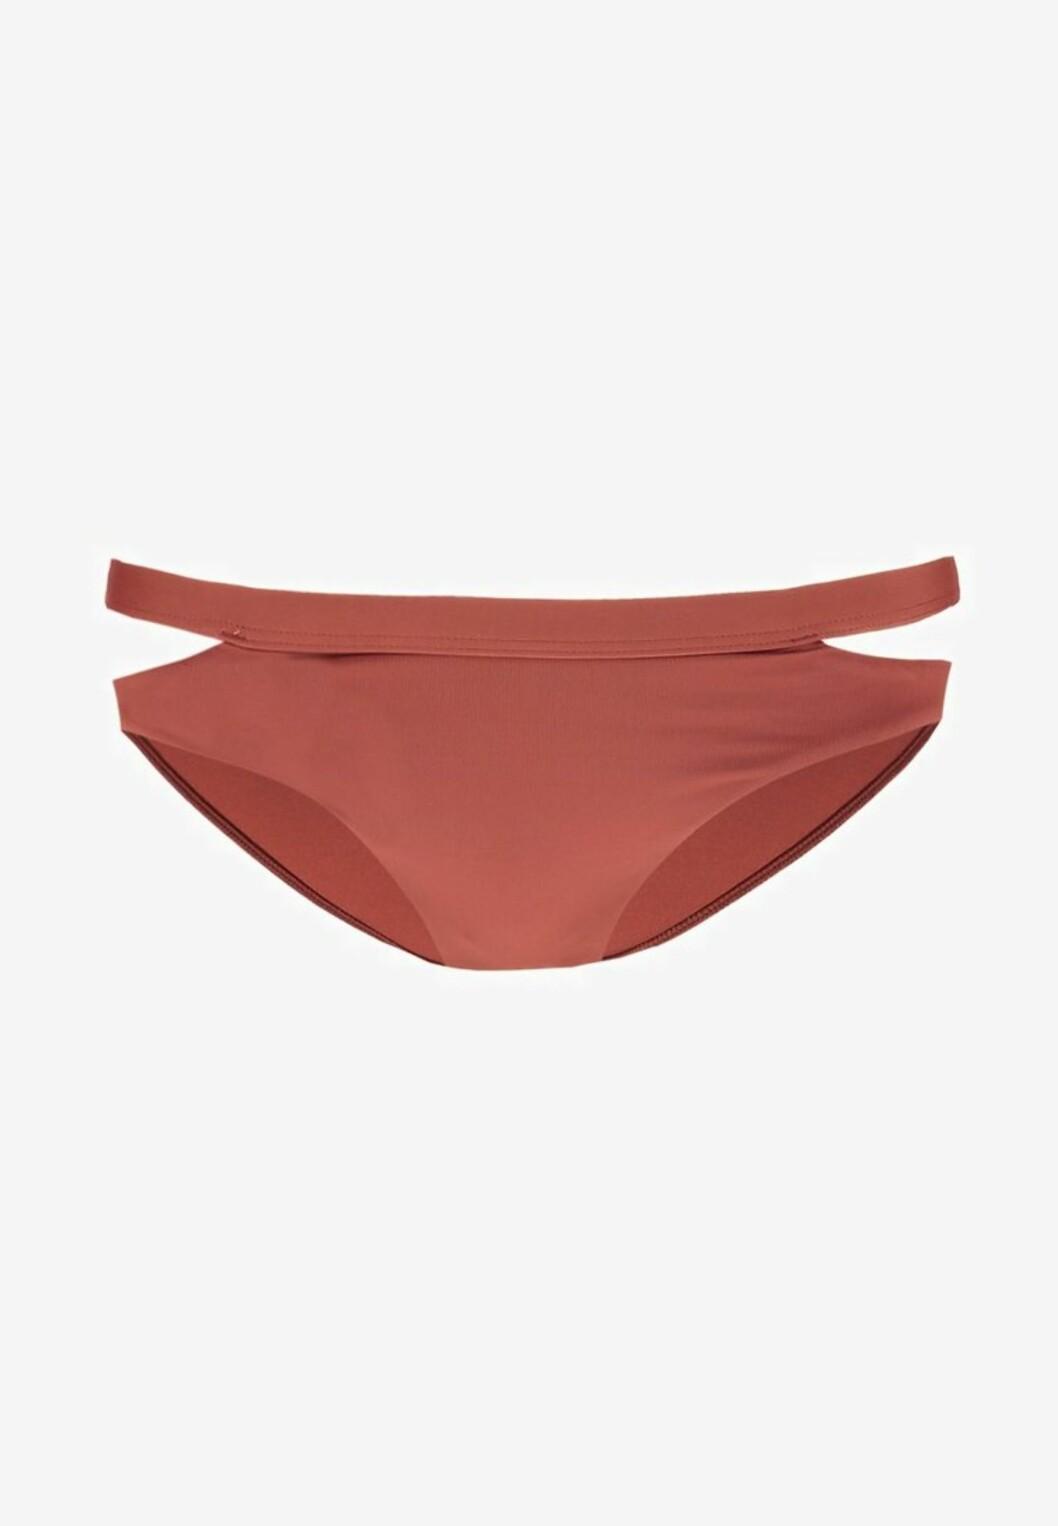 <strong>Bikinitruse fra Seafolly via Zalando  529,-  https:</strong>//www.zalando.no/seafolly-active-split-band-hipster-bikini-truse-burnt-amber-s1941h04o-g11.html